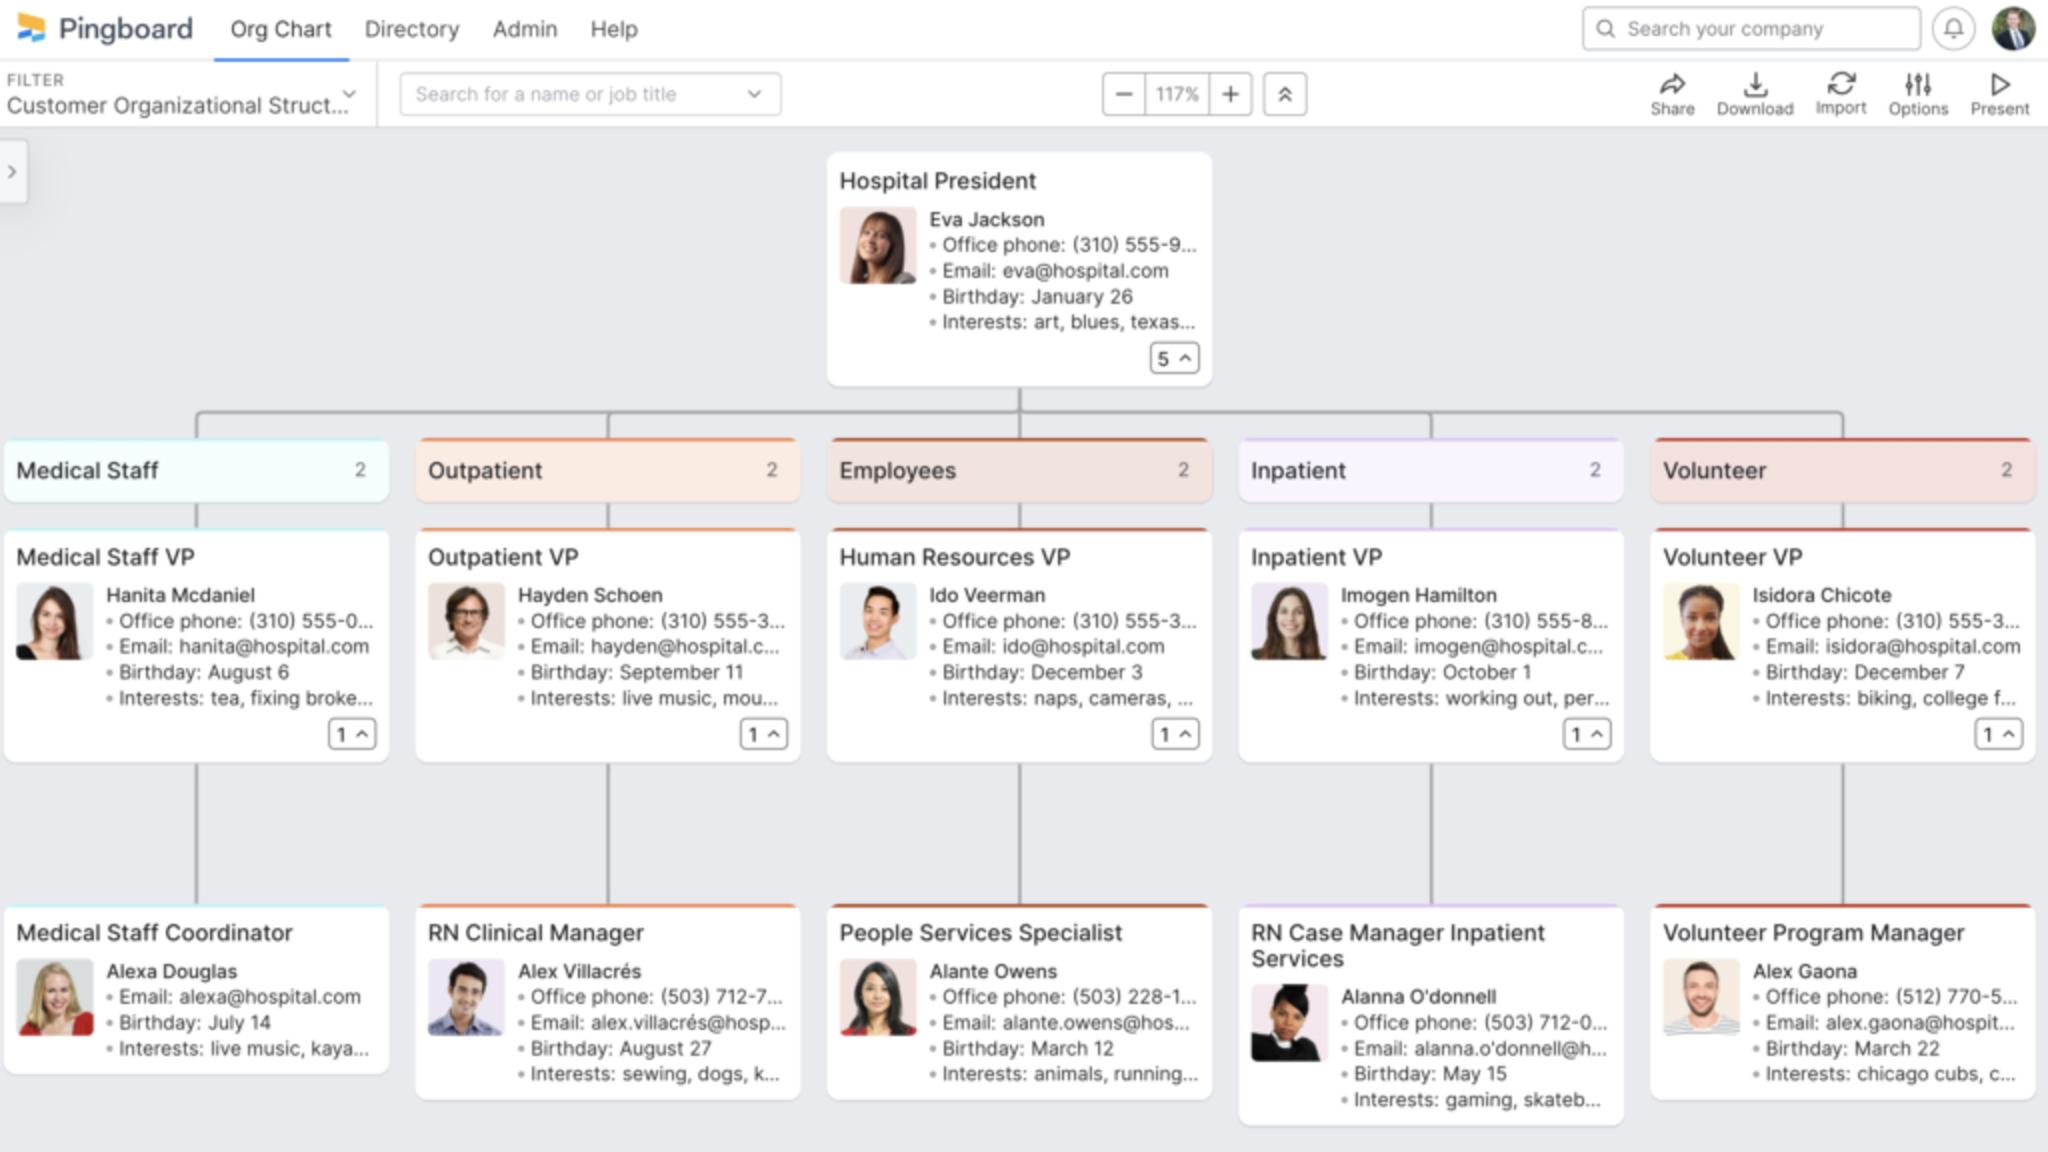 Customer Organizational Structure